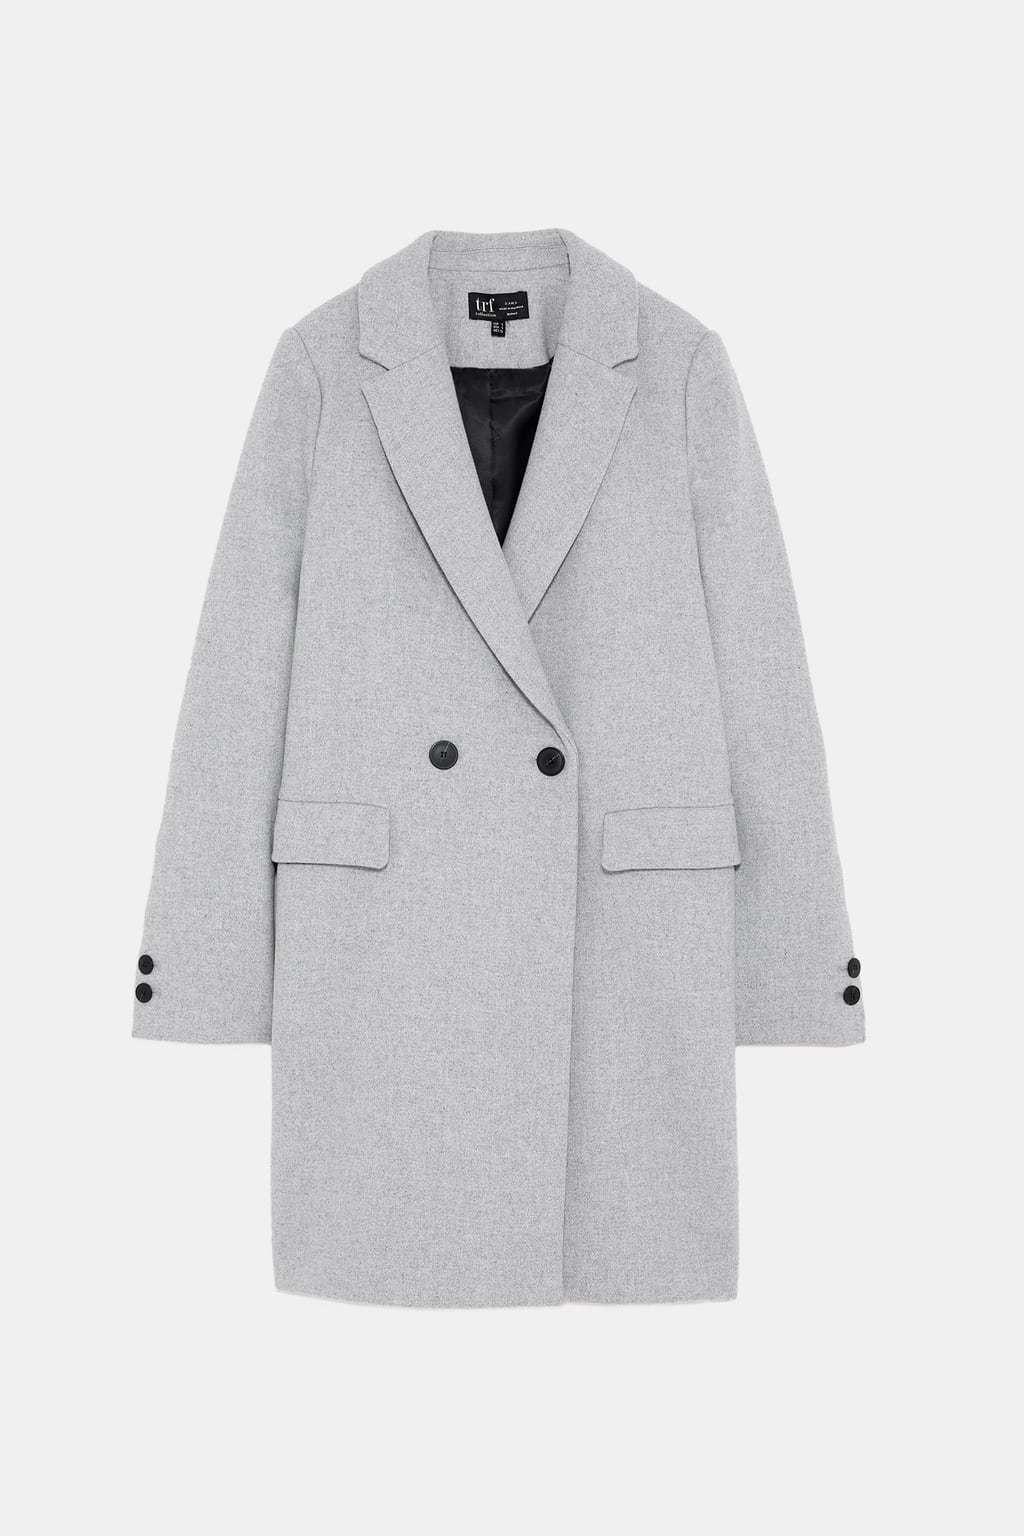 Abrigo corte masculino.De 59,95 a 39,99 euros.